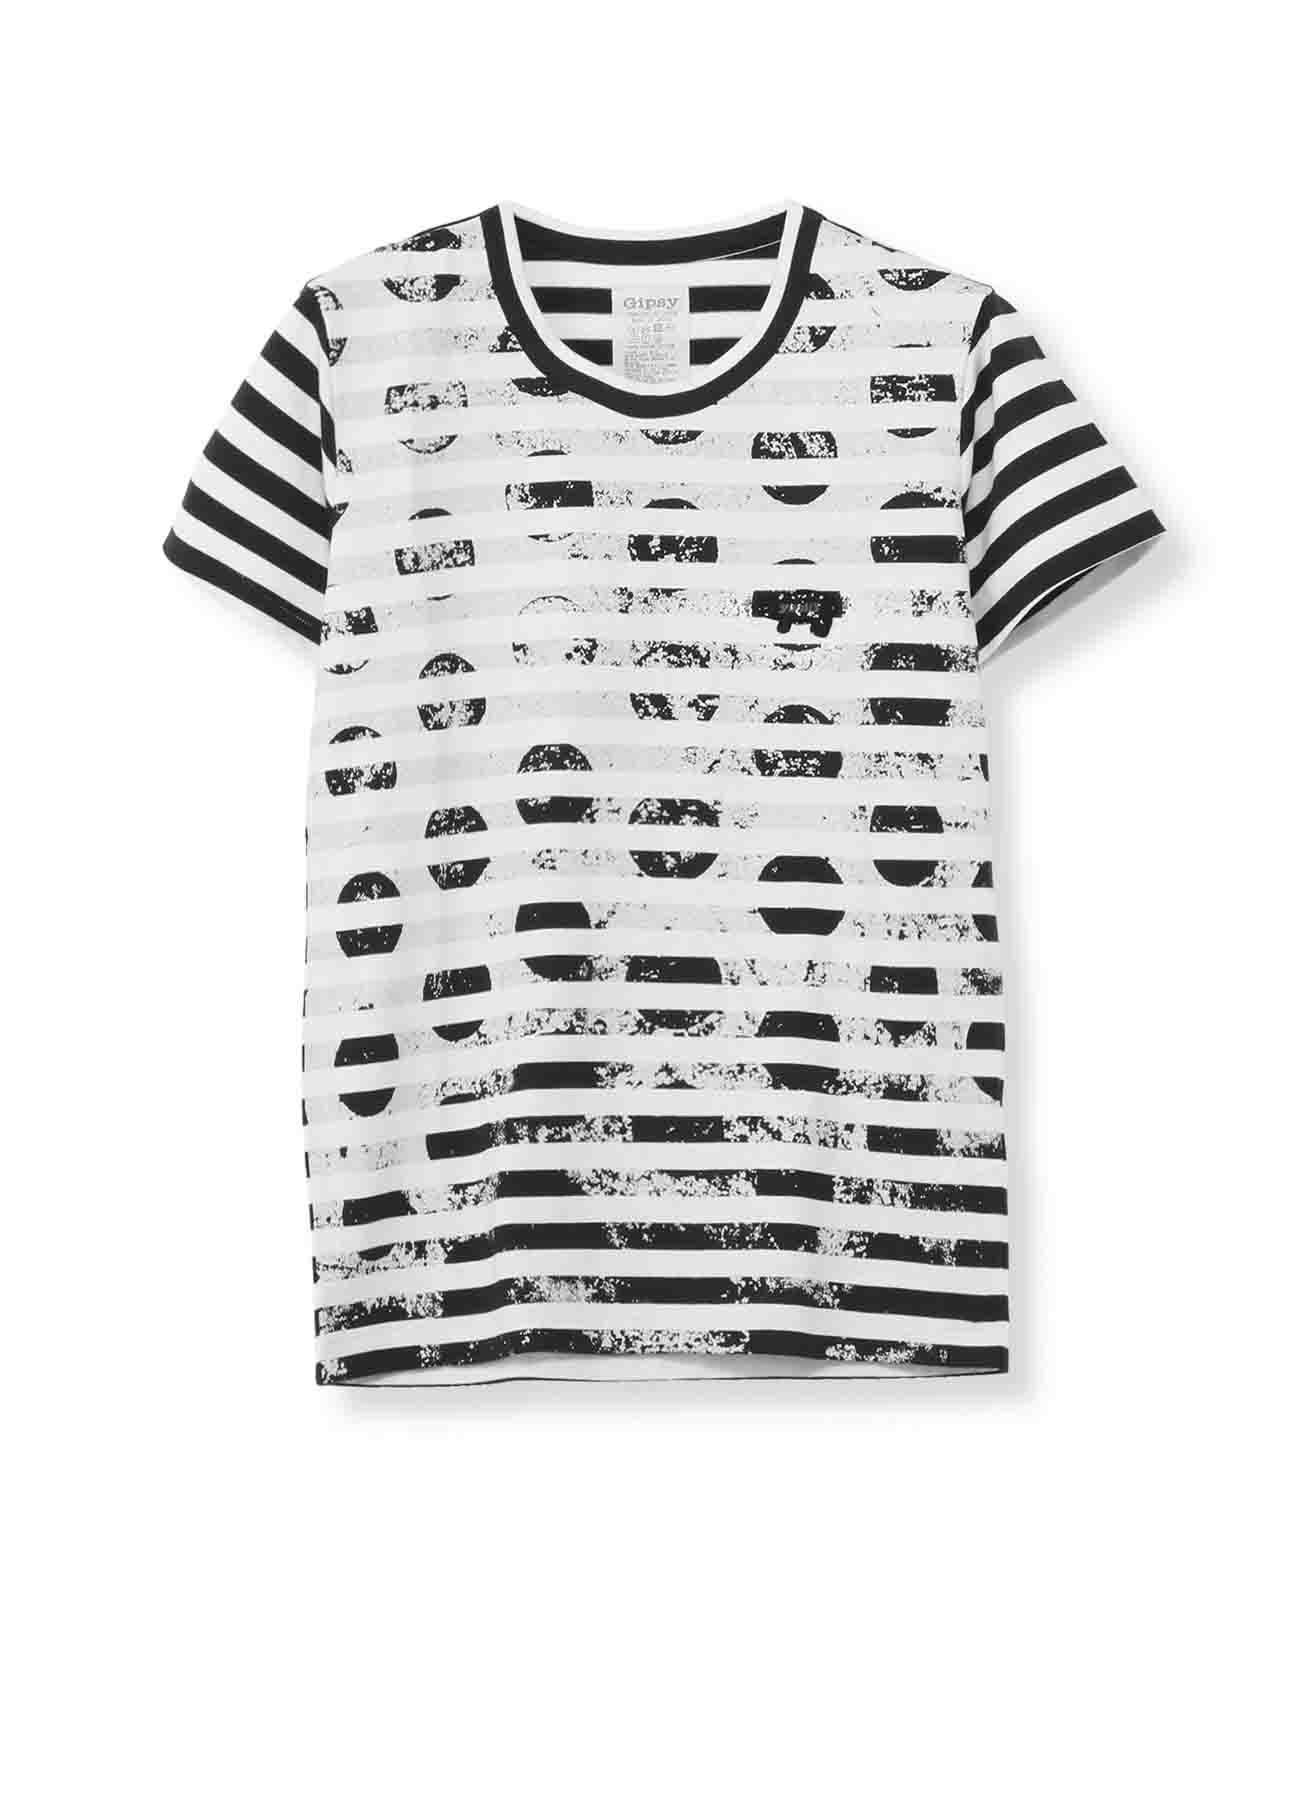 Gipsy ボーダー天竺擦れ水玉顔料プリント 丸首半袖Tシャツ